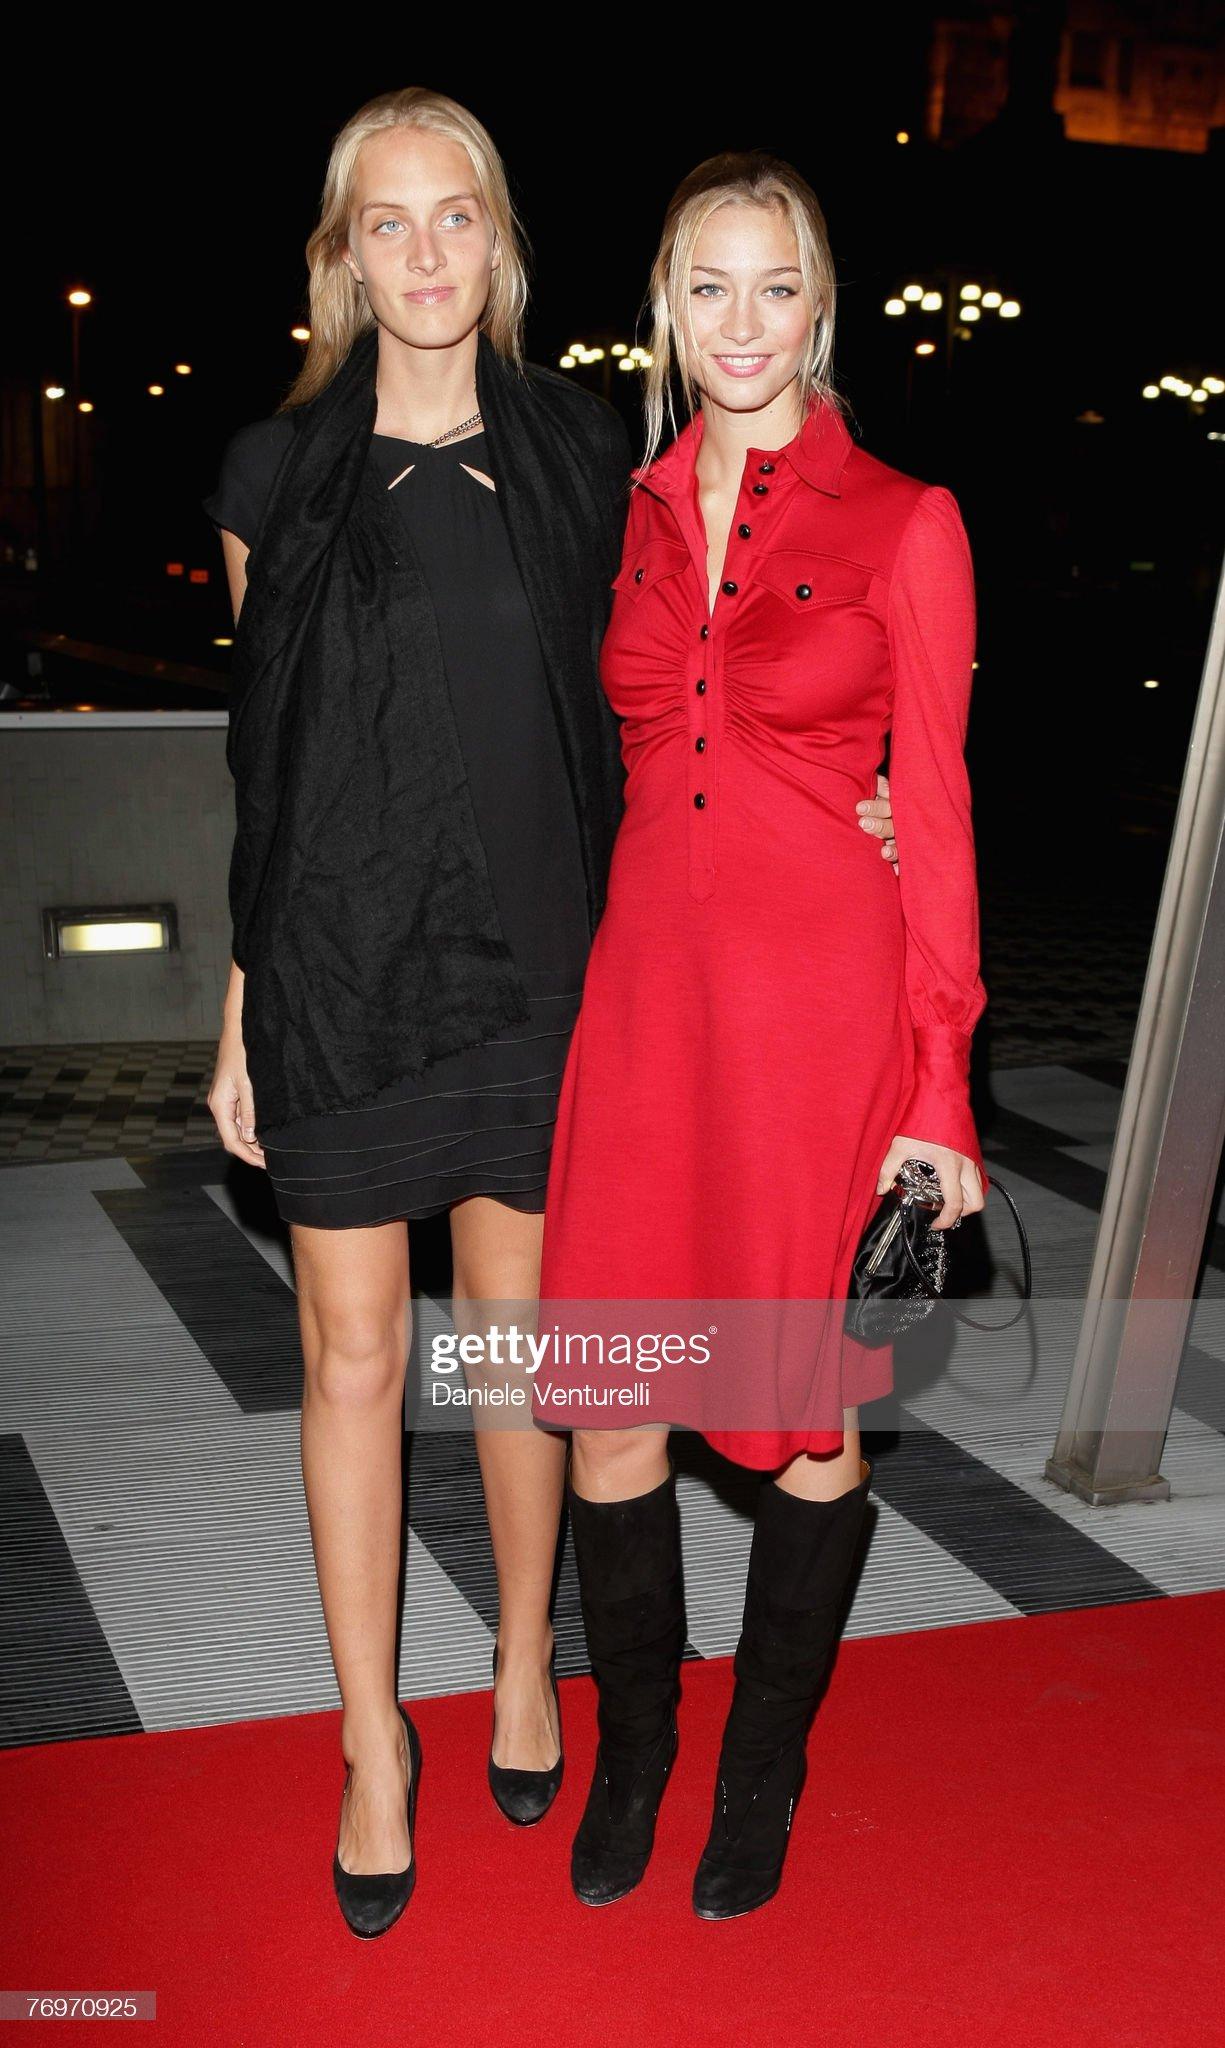 Milan Fashion Week Spring/Summer 08 - Vivienne Westwood - Gala Dinner : News Photo